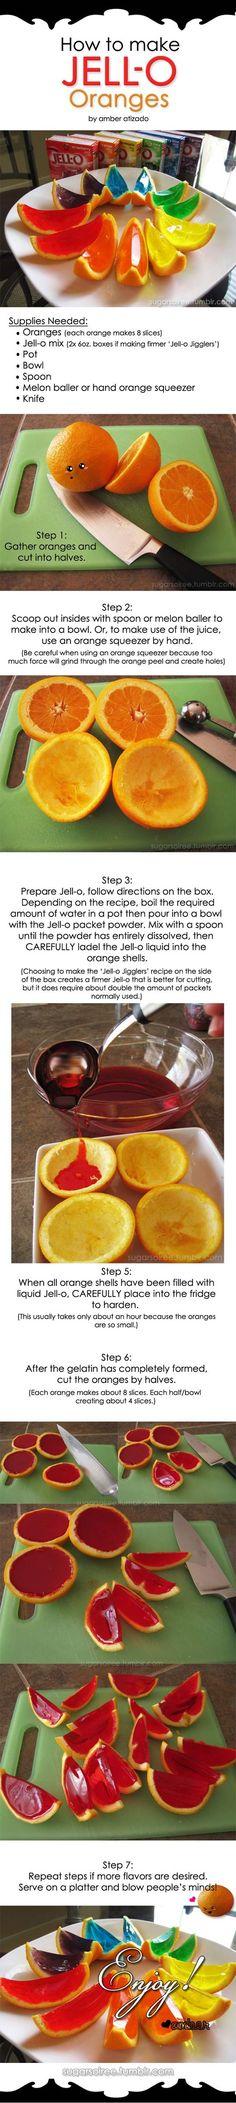 Jell-O Oranges Tutorial